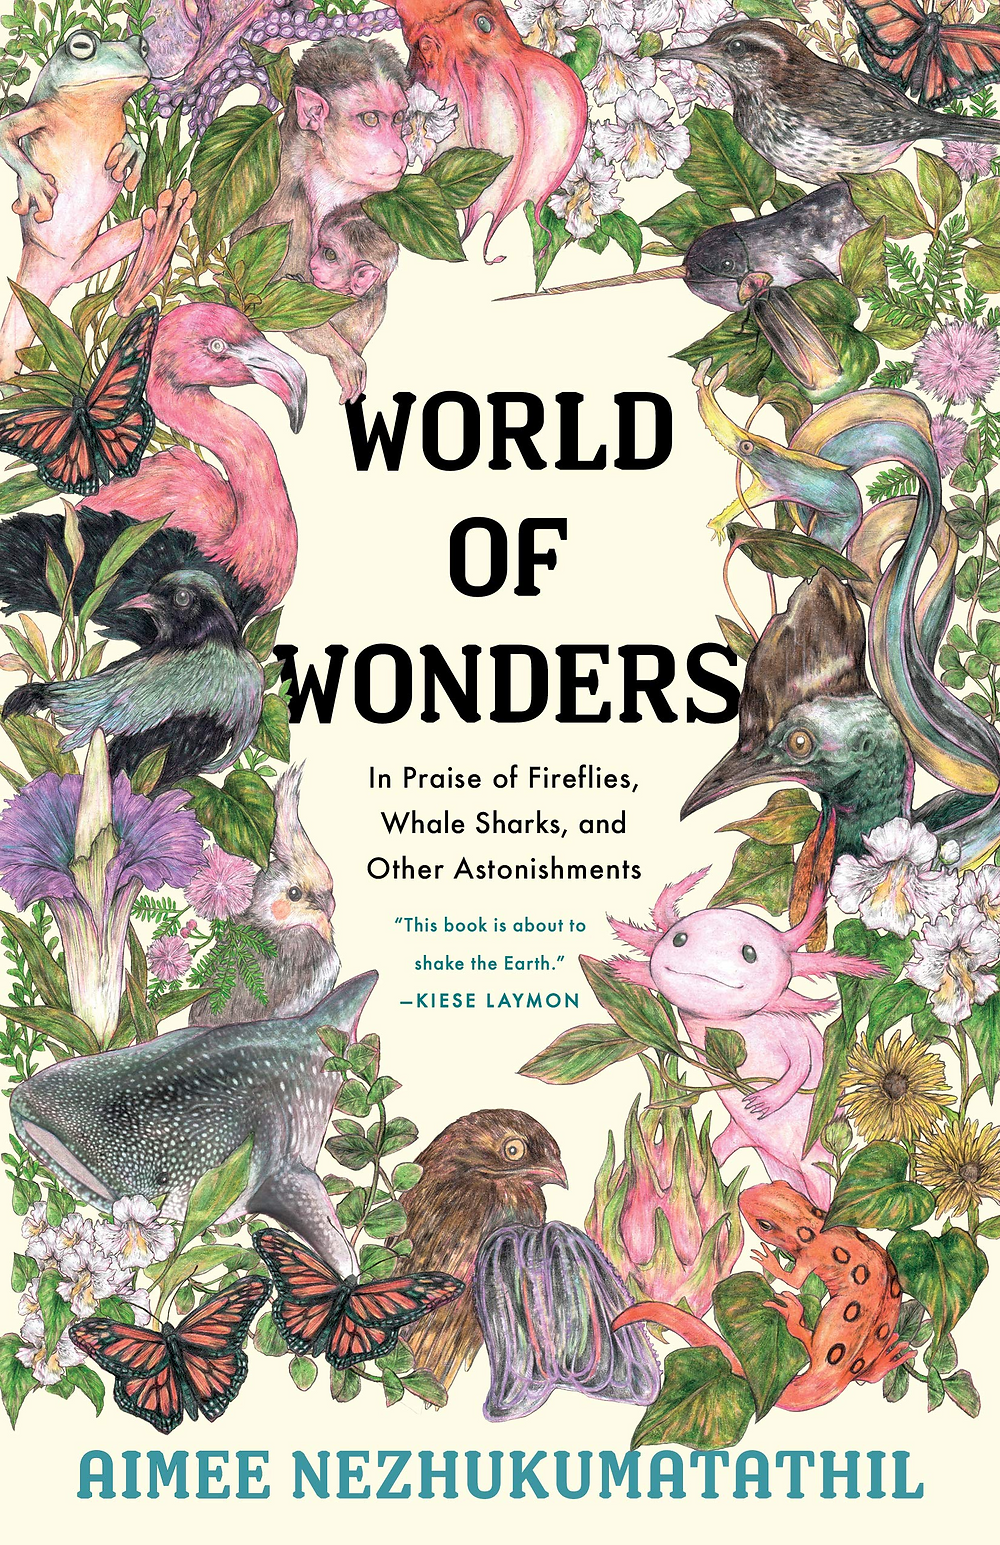 Cover image of the book World of Wonders by Aimee Nezhukumatathil